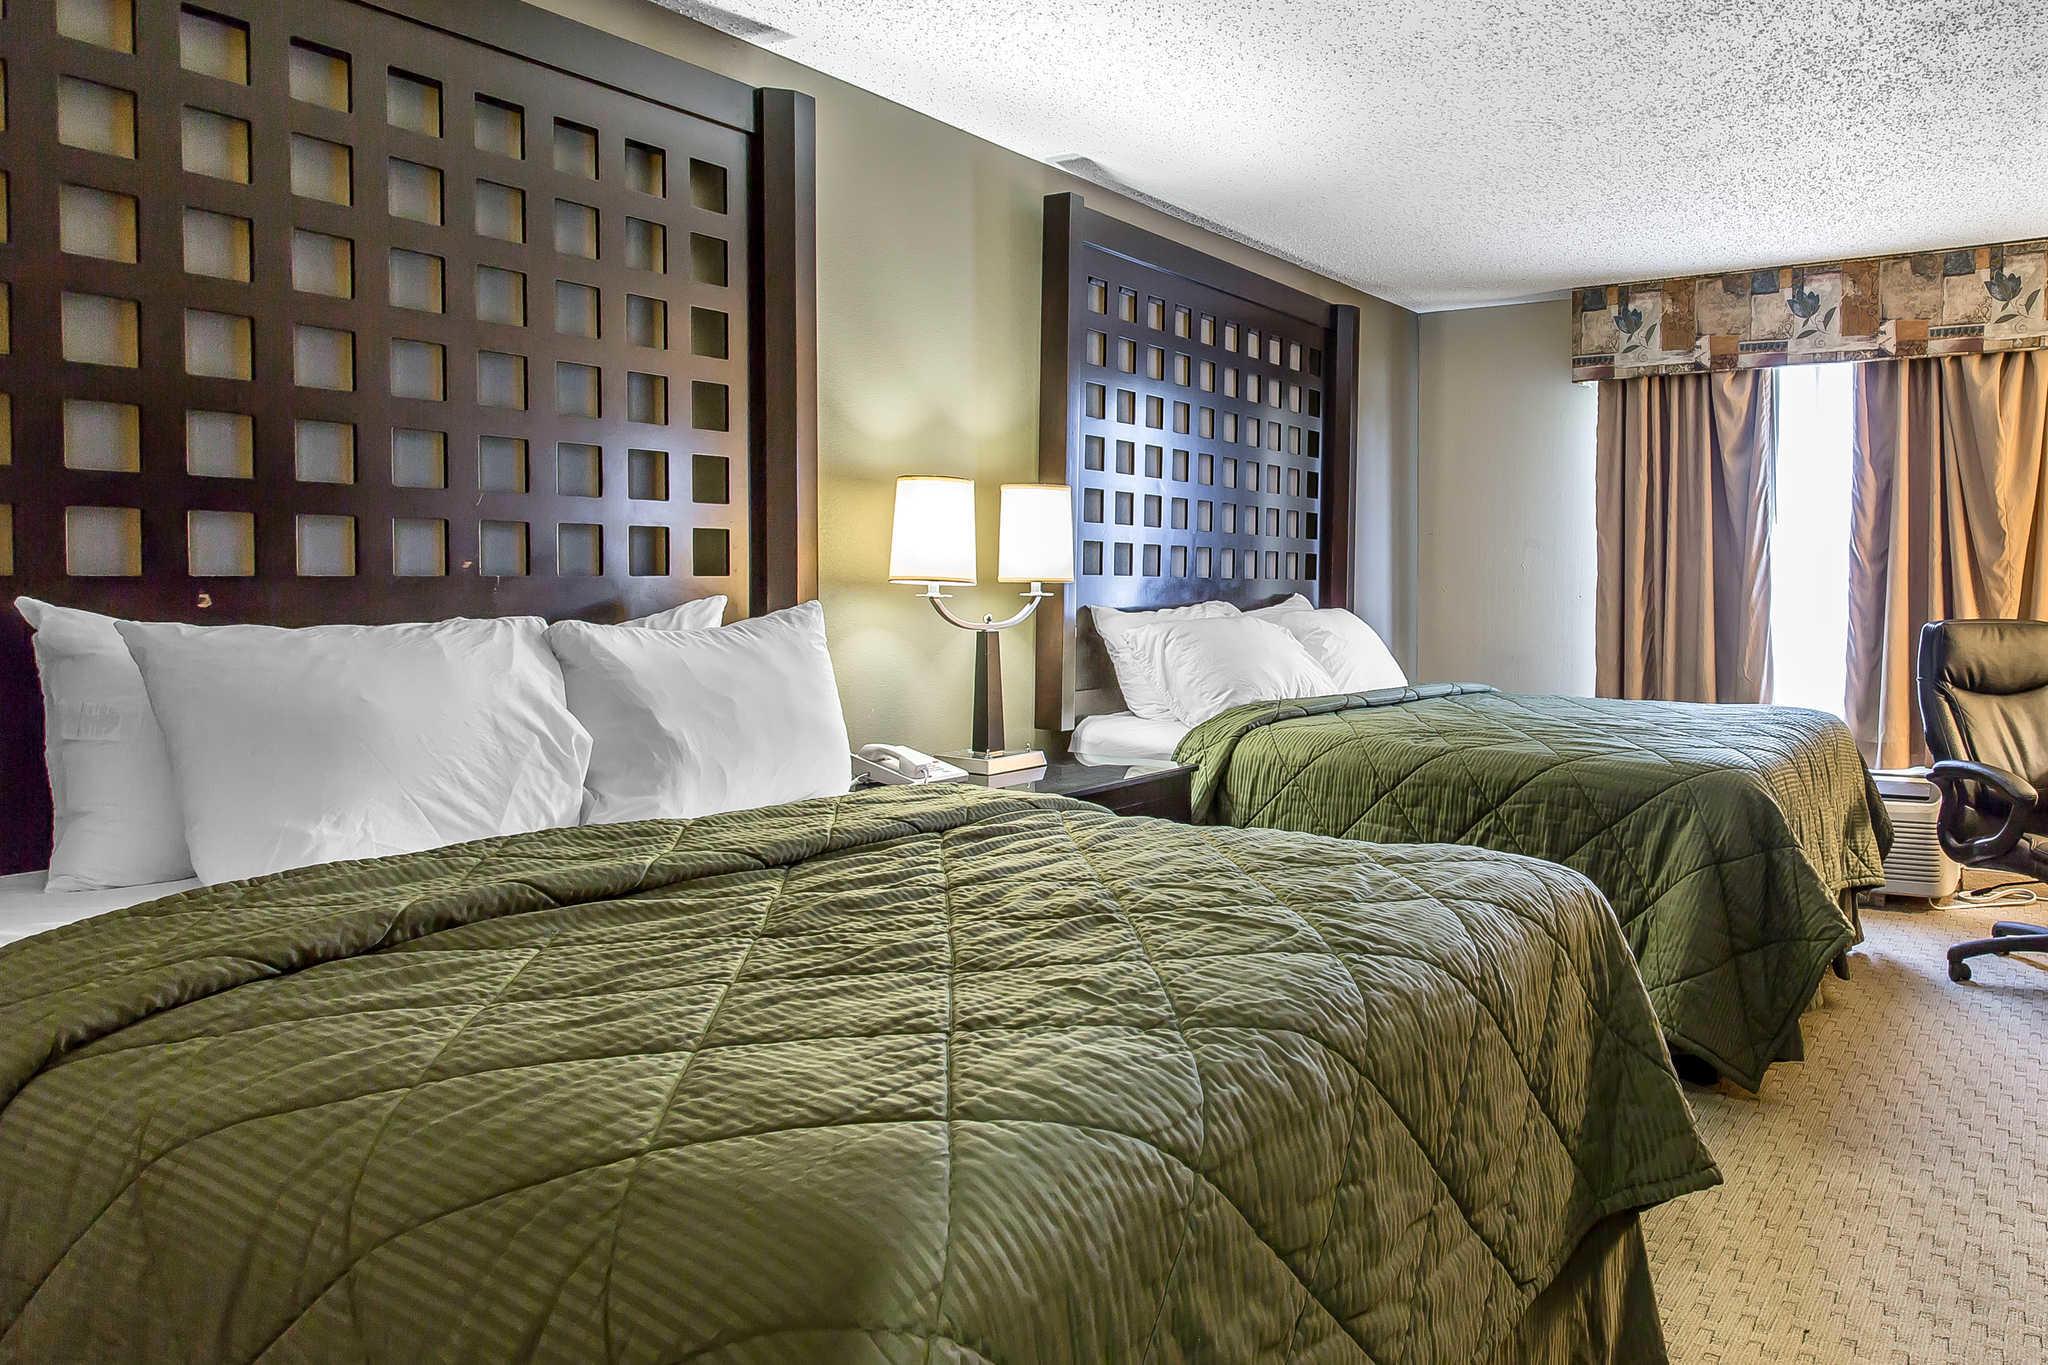 Quality Inn & Suites Durant image 14